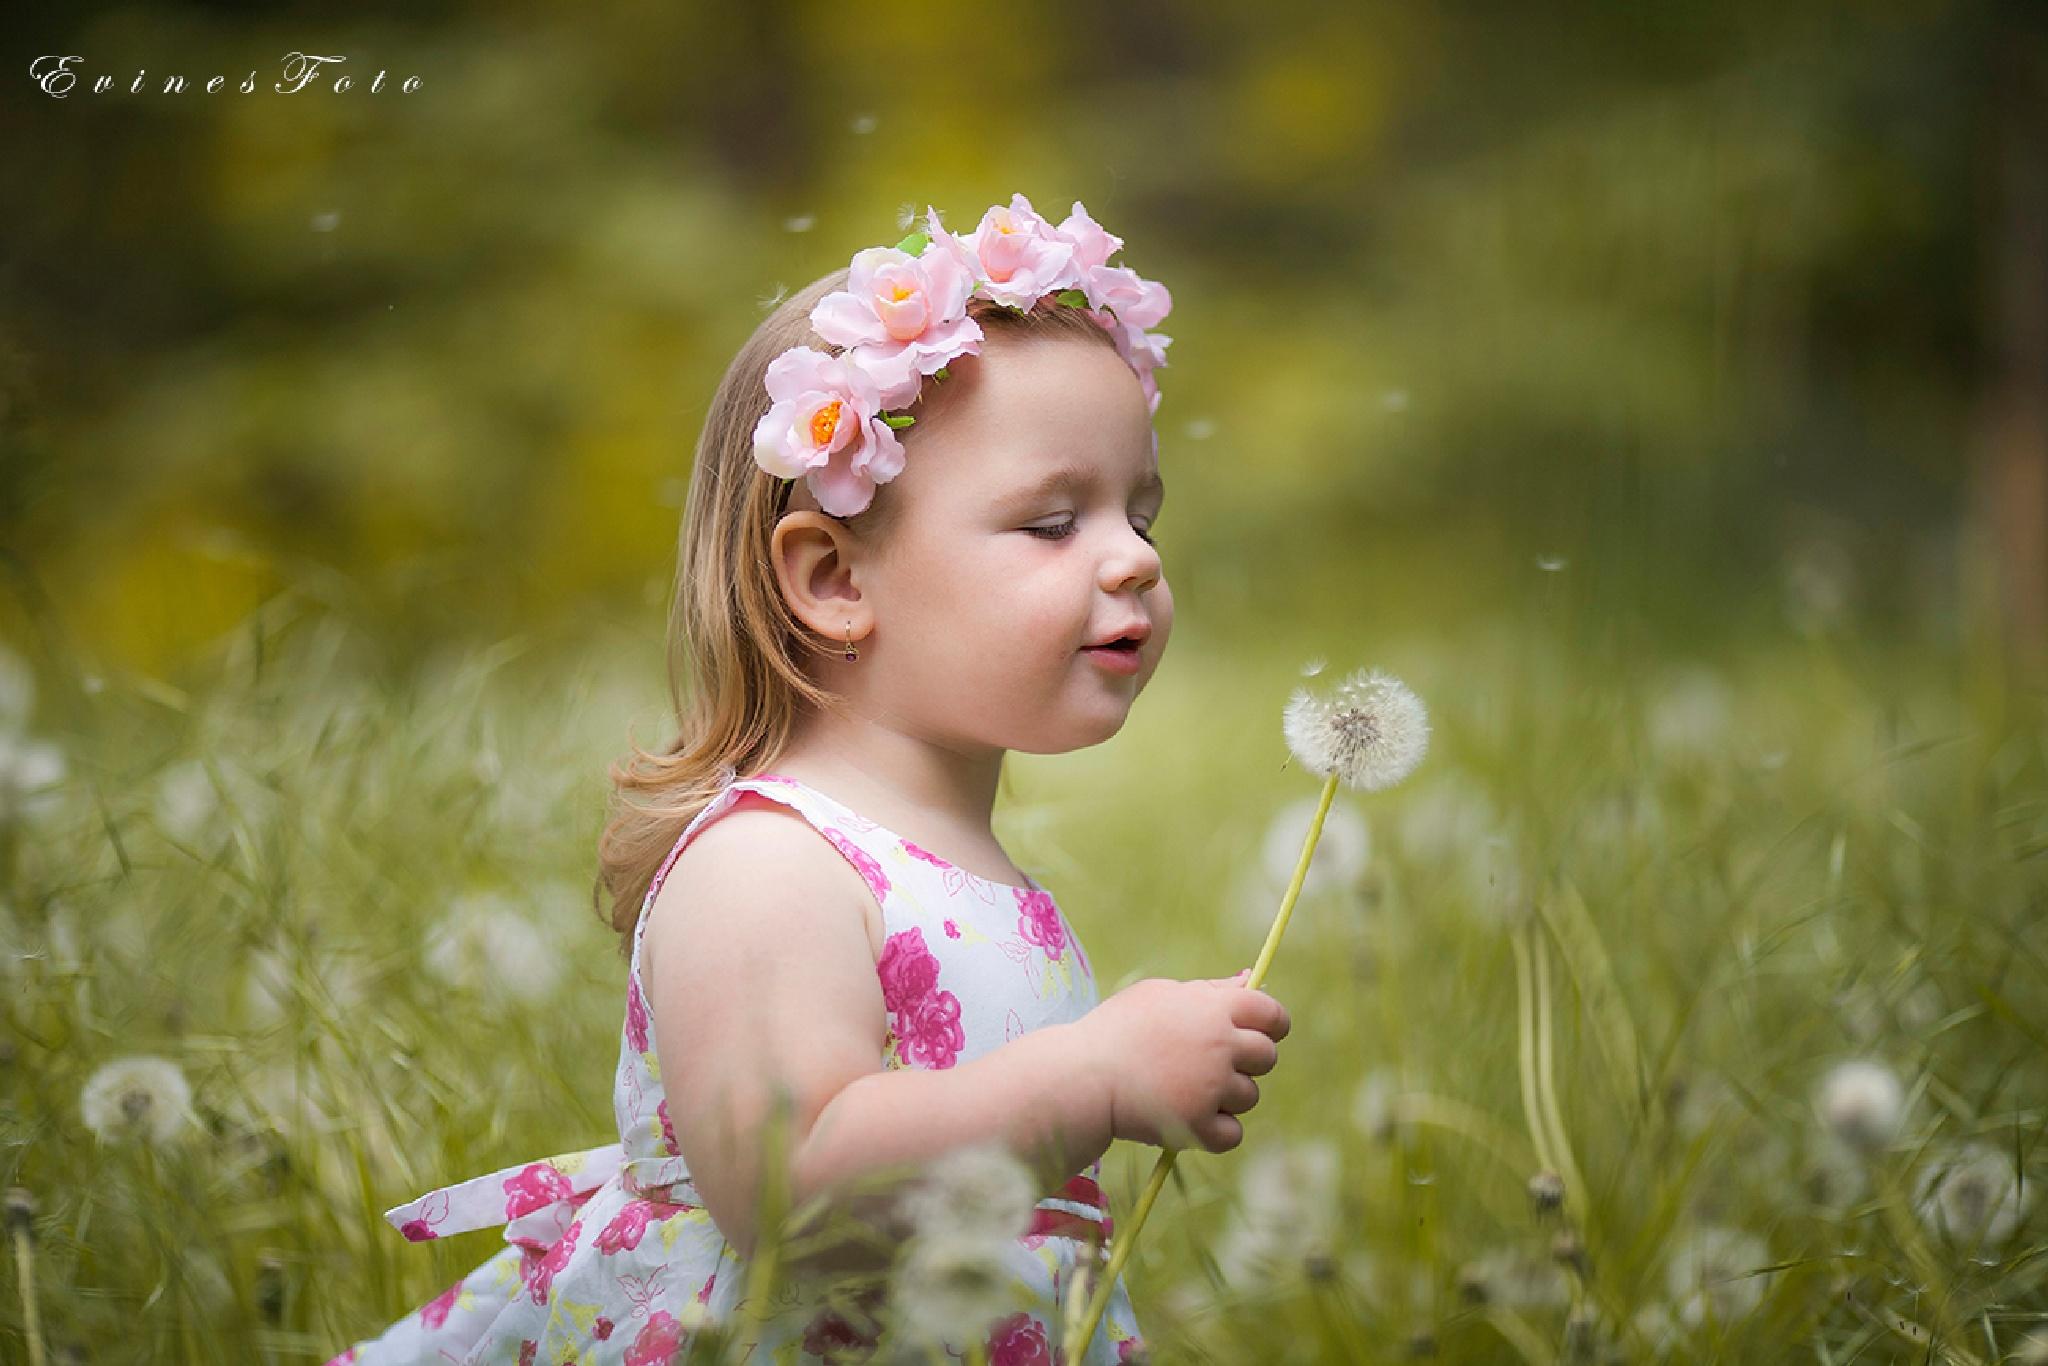 Dandelion princess by Evines